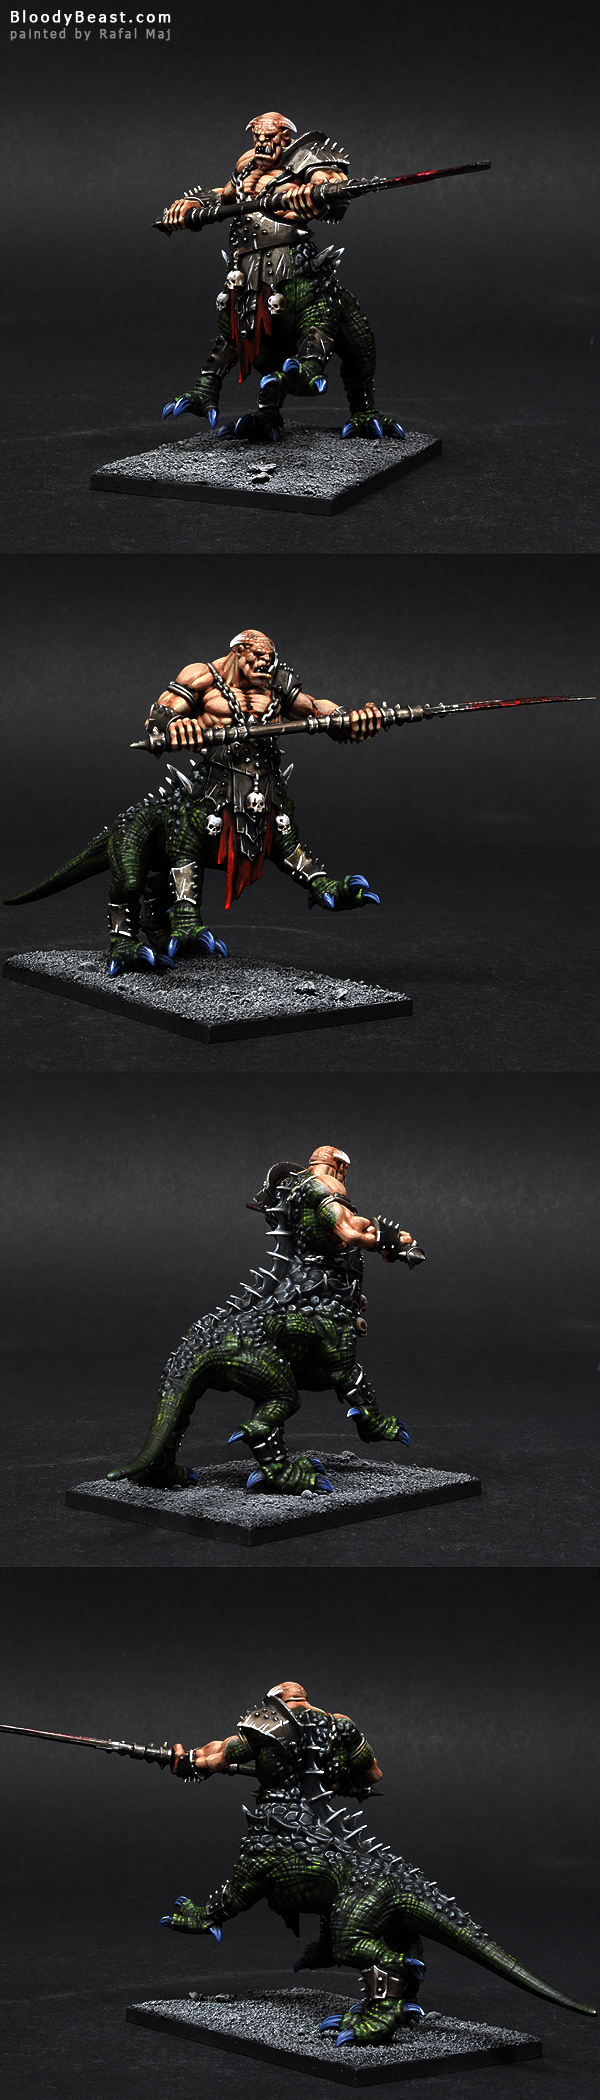 Dragon Ogre painted by Rafal Maj (BloodyBeast.com)